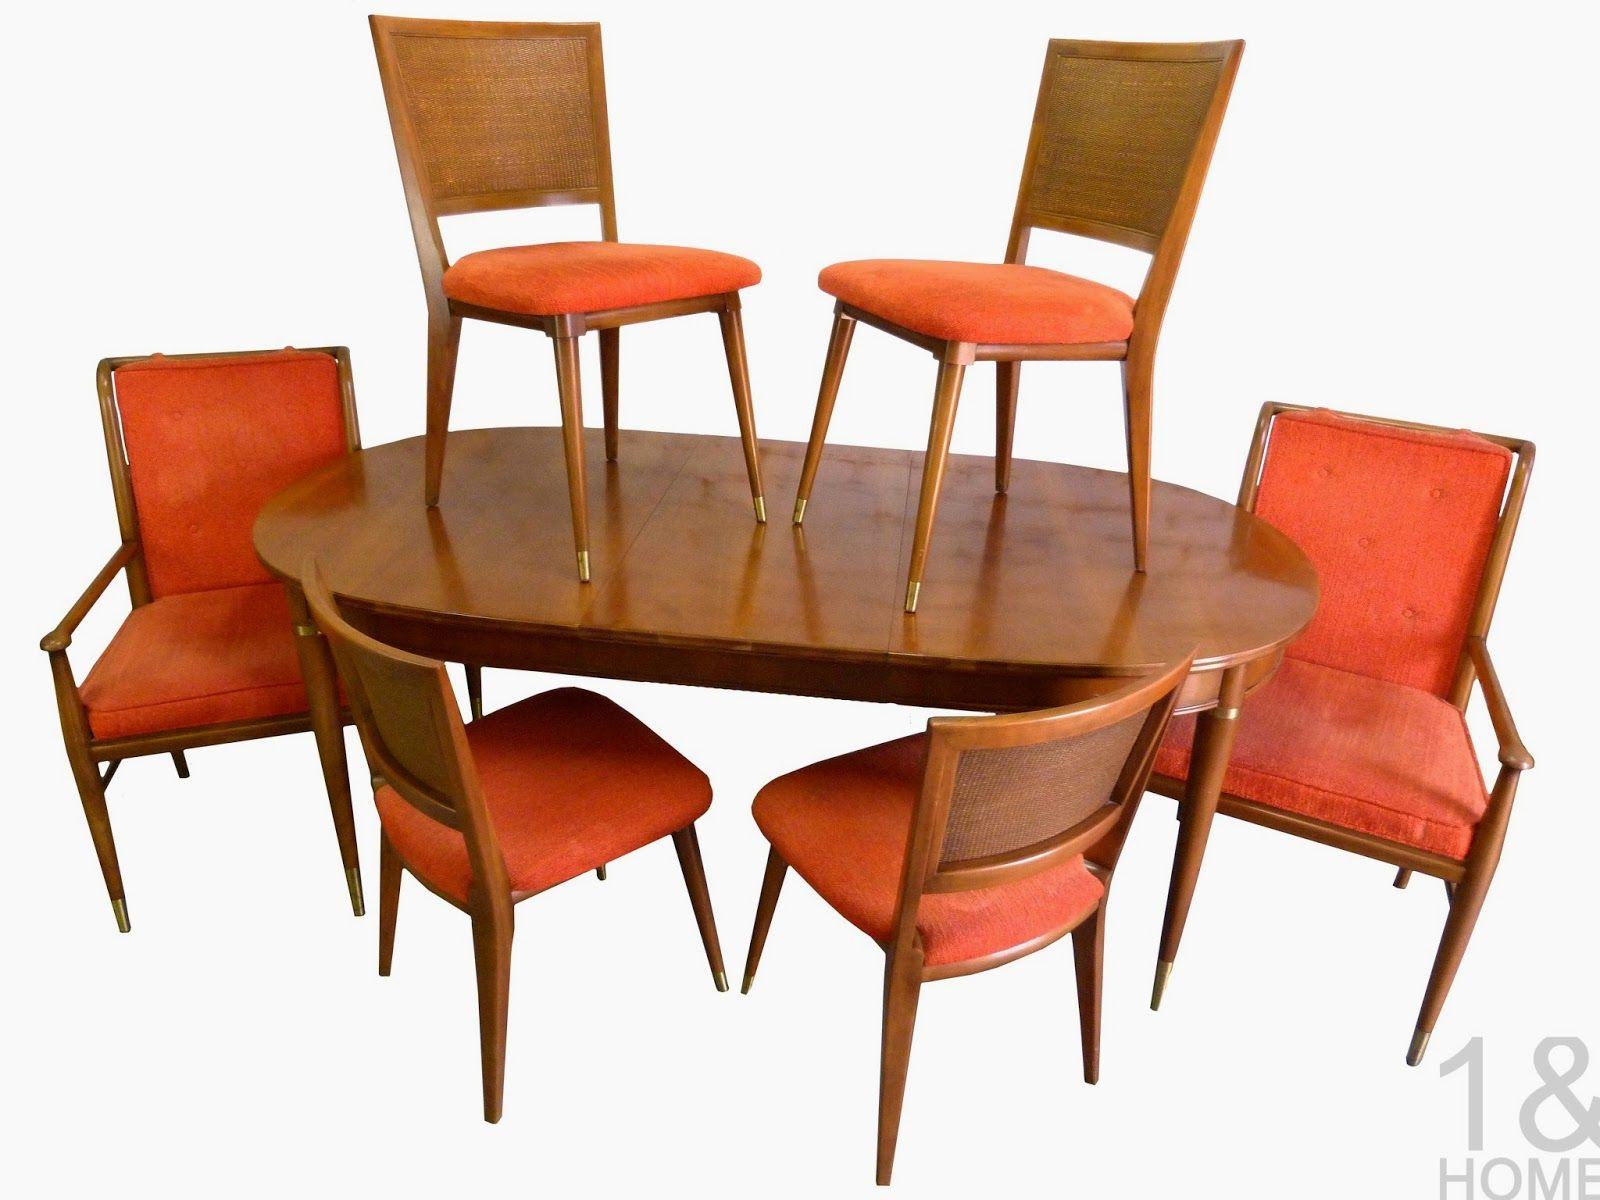 Dining Tables  Widdicomb 50S60S Furniture  Pinterest  60S Glamorous Danish Modern Dining Room Design Inspiration